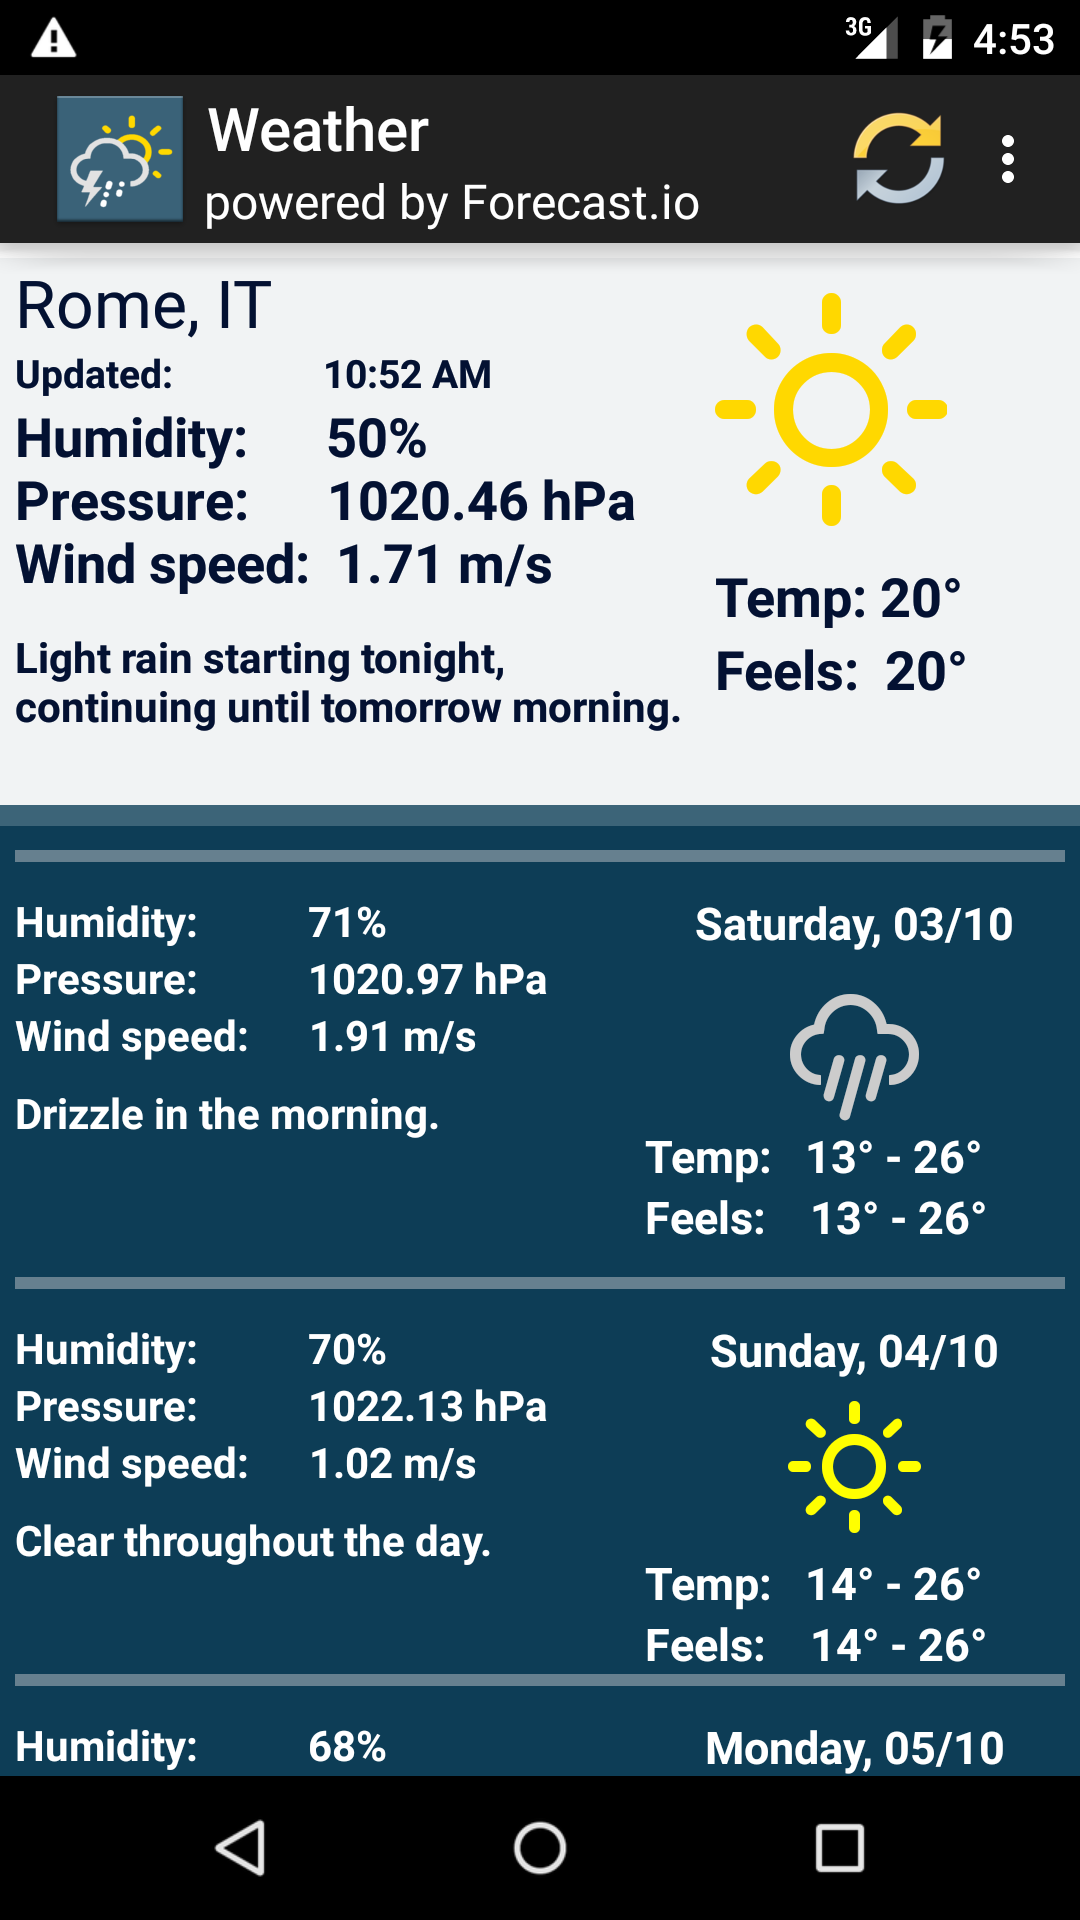 Weather week forcast forecast.io  Amazon.de Apps & Spiele